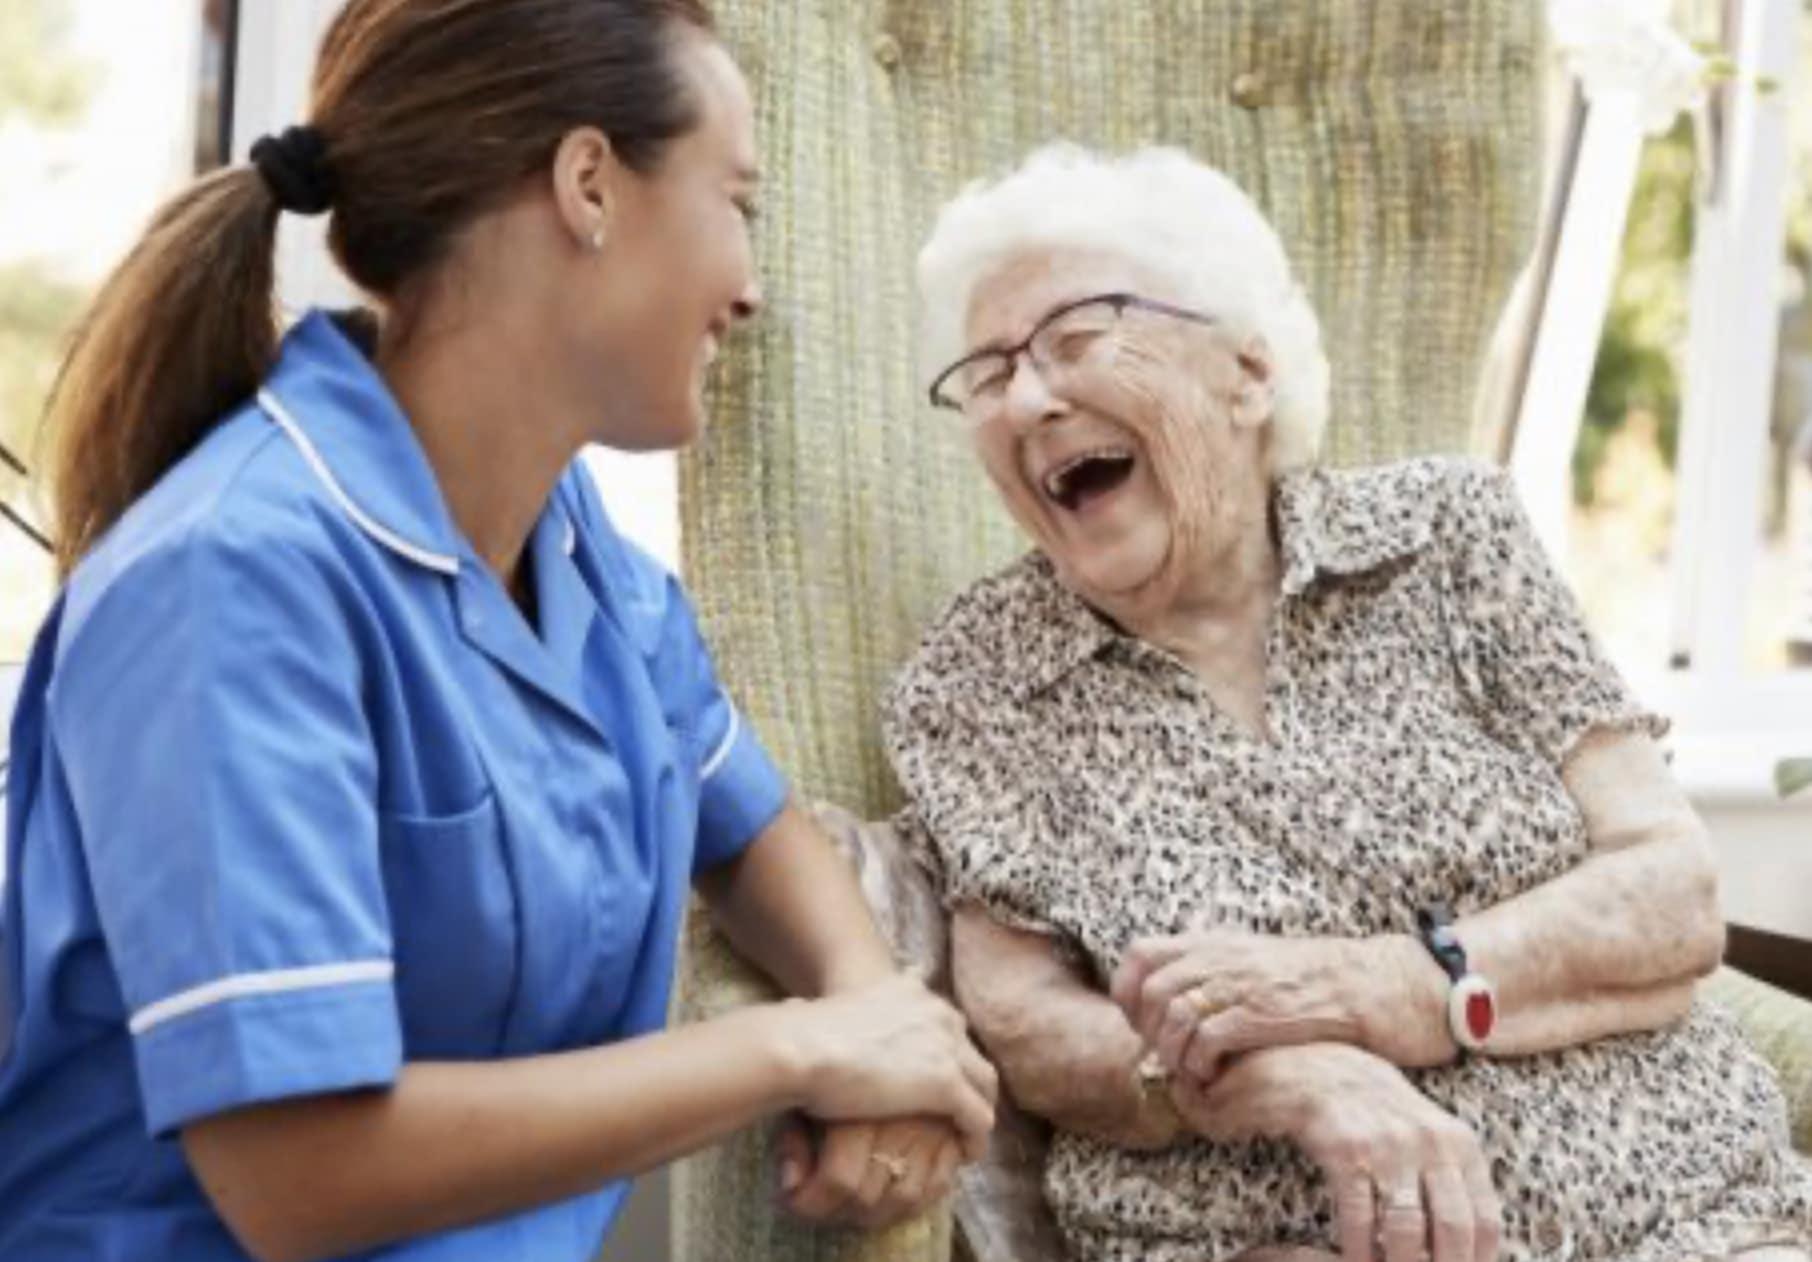 Holistic Geriatric Care